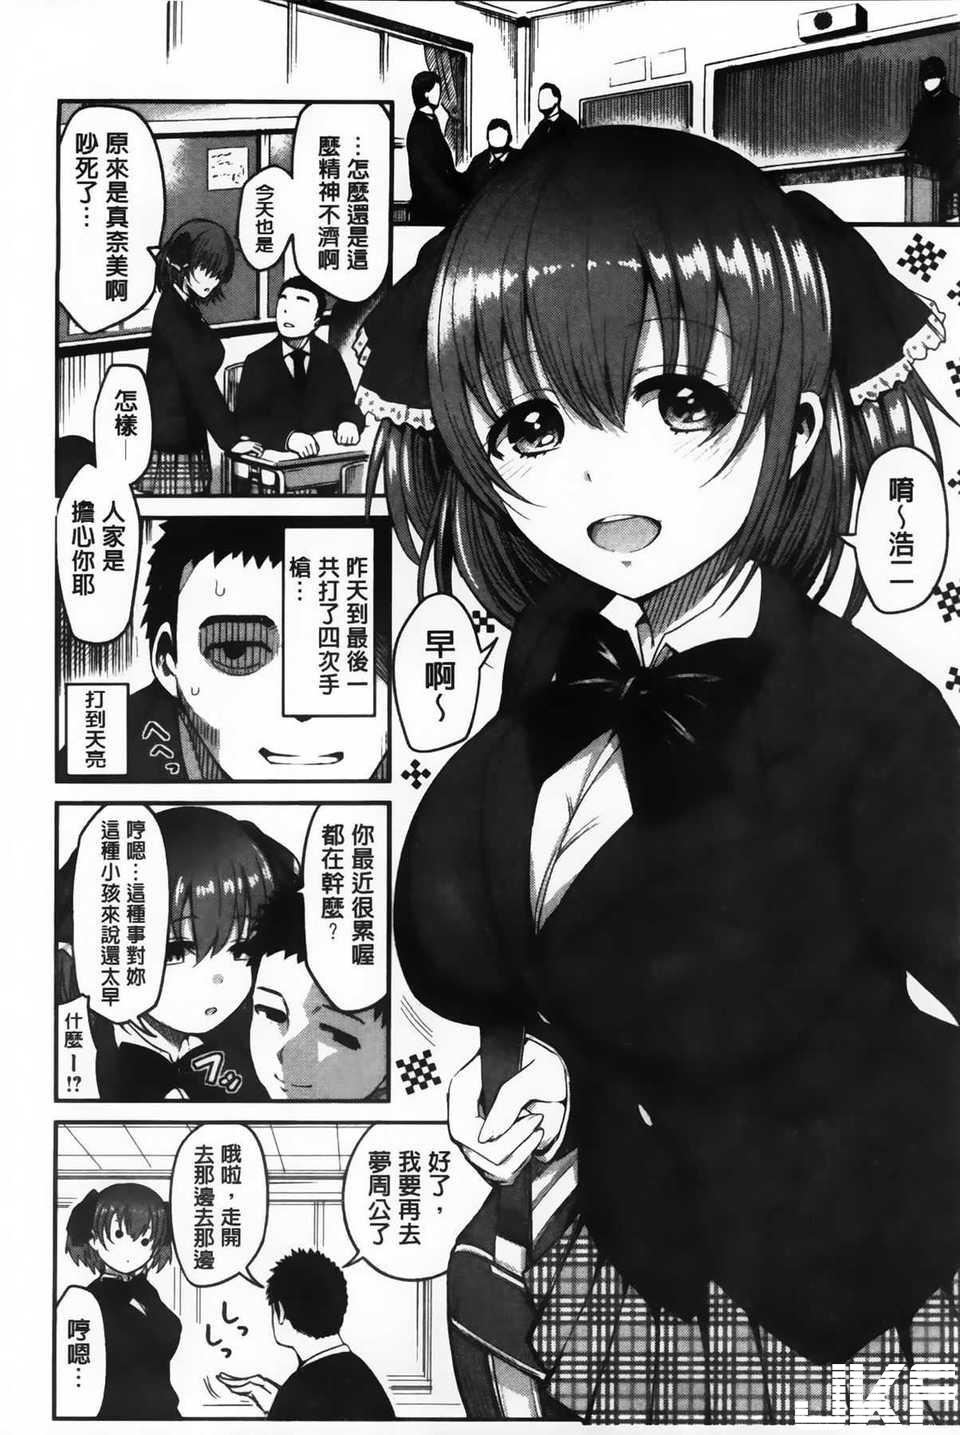 AoJiaoZero_084.jpg